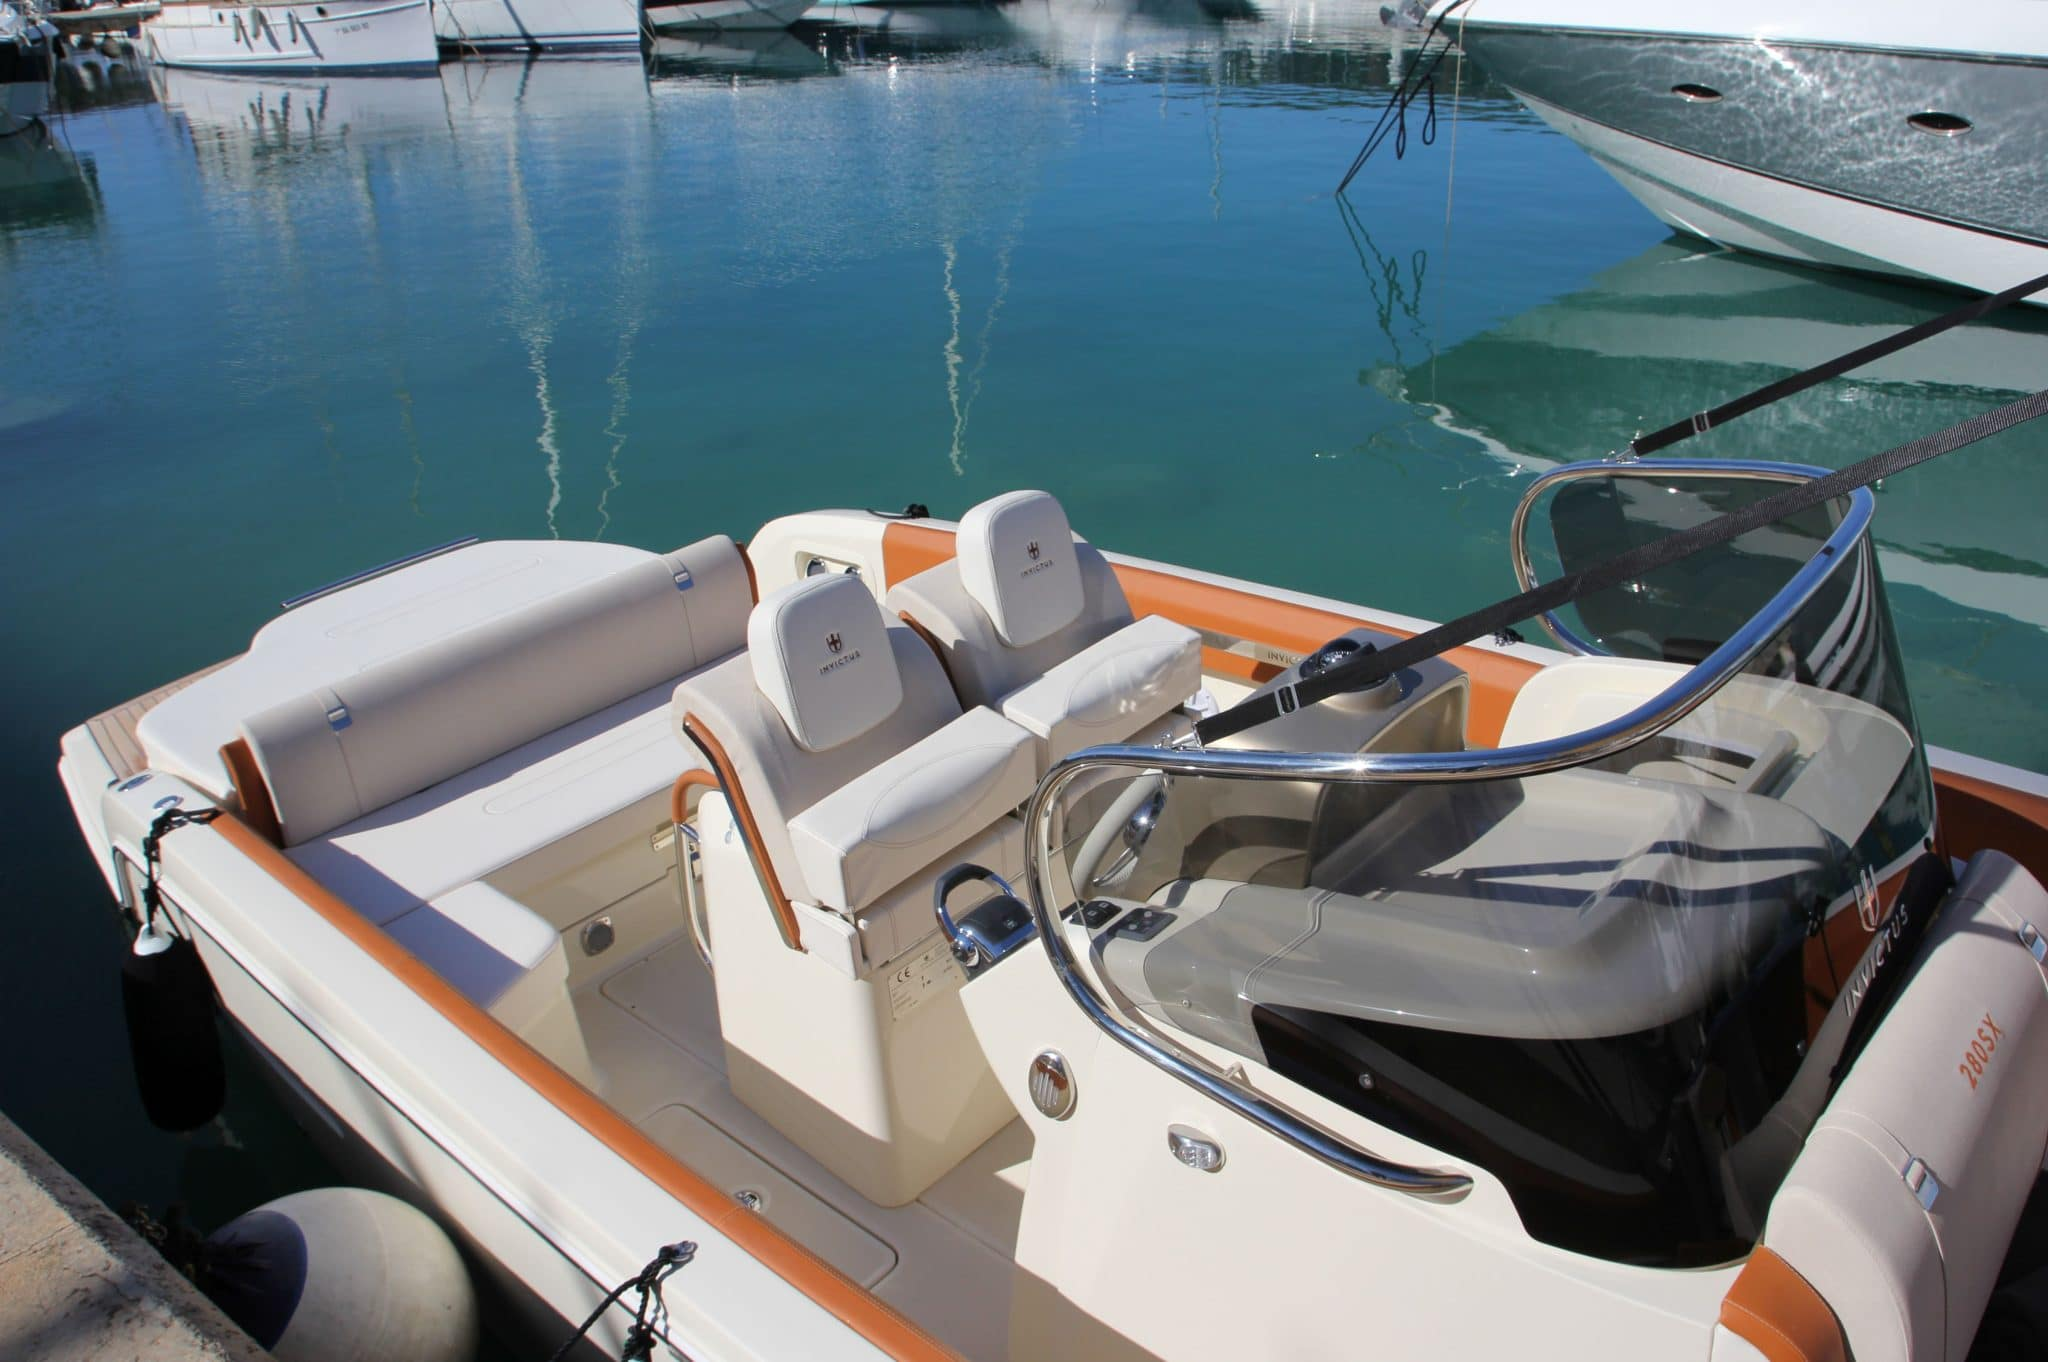 Motorboot_Invictus280FX_10-2048×1362